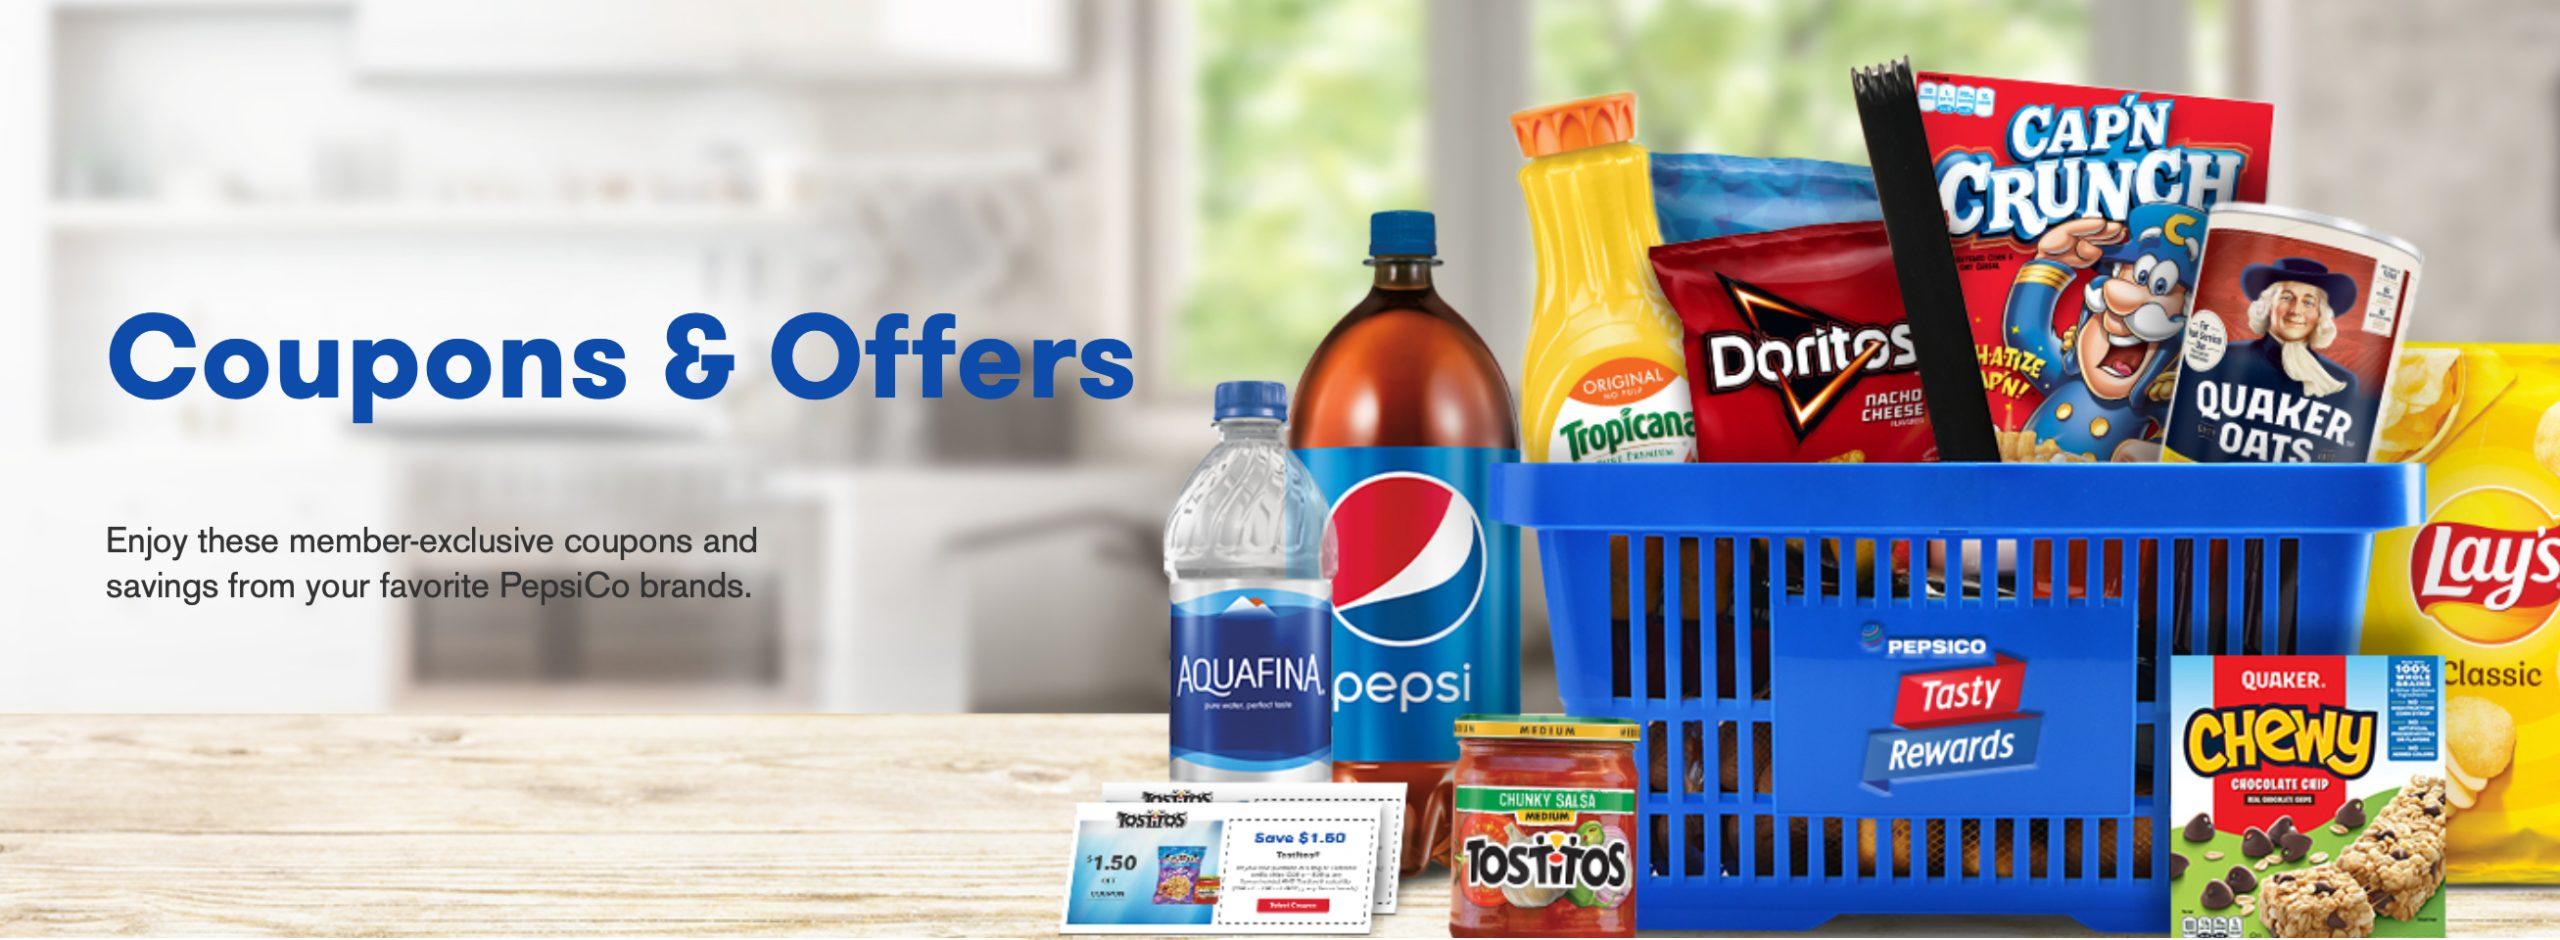 PepsiCo Tasty Rewards Sweepstakes - Enter To Win $2,021 on I Heart Publix